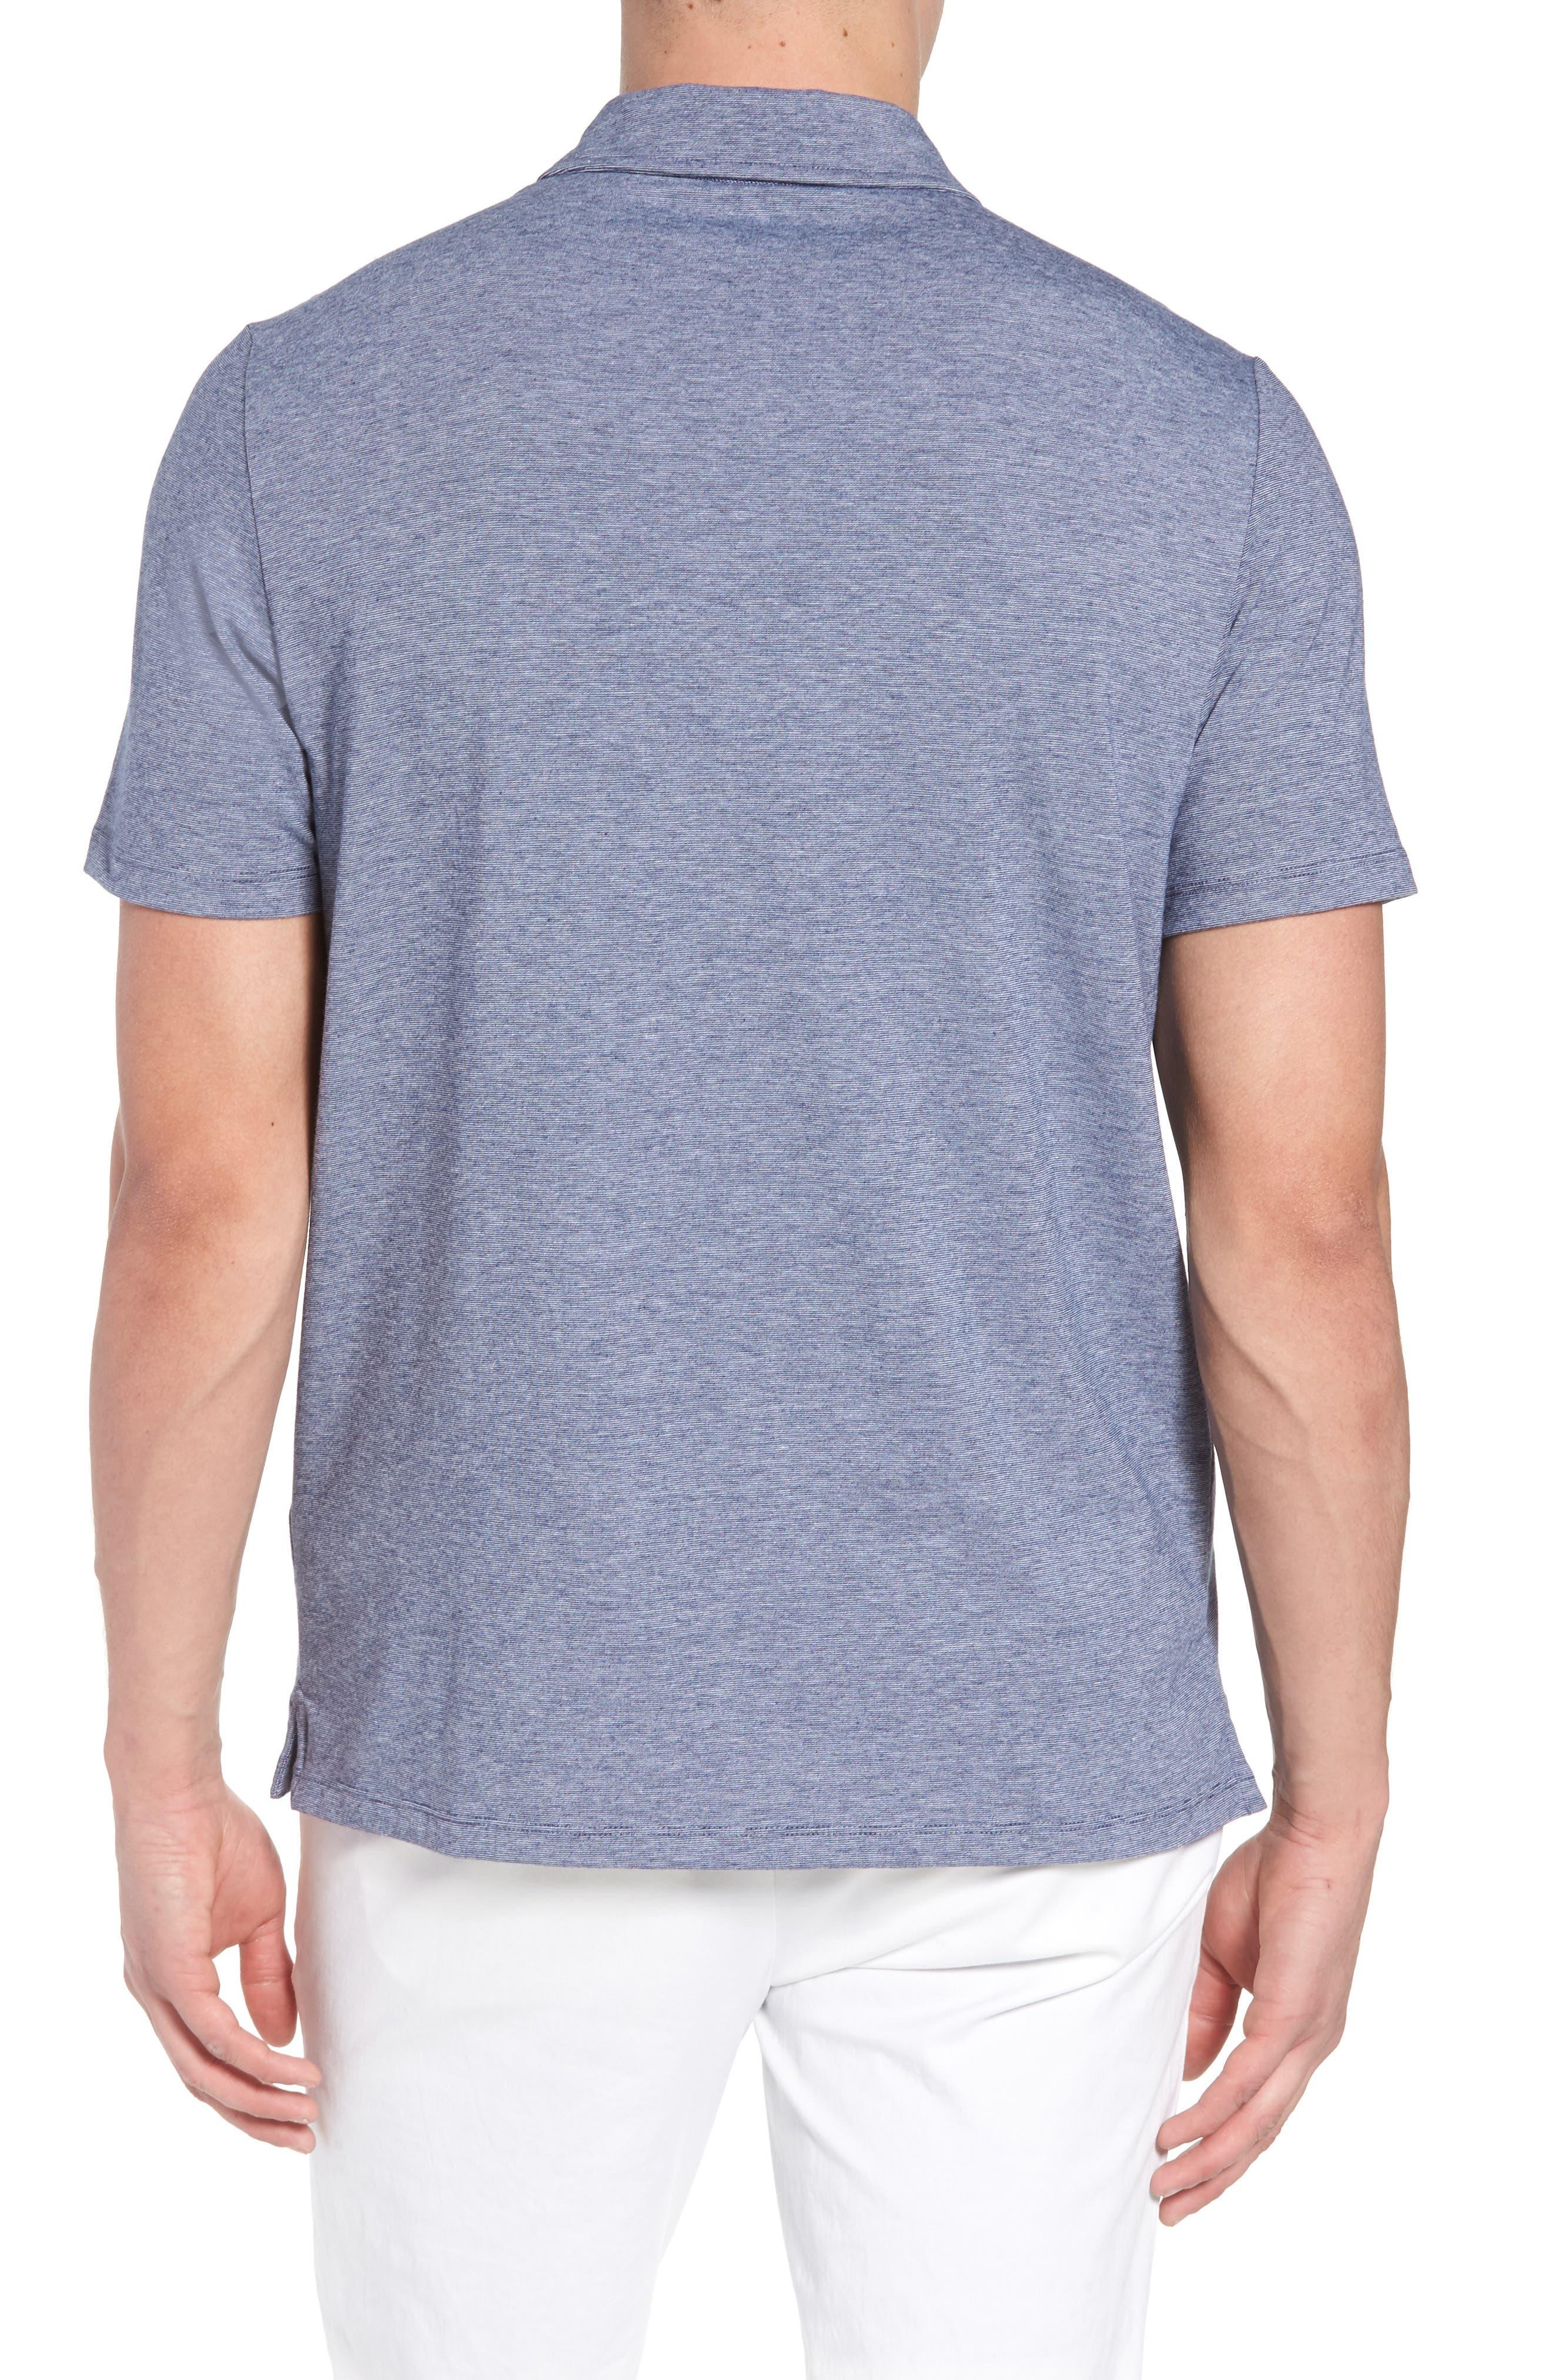 VINEYARD VINES,                             Edgartown Polo Shirt,                             Alternate thumbnail 2, color,                             DEEP BAY